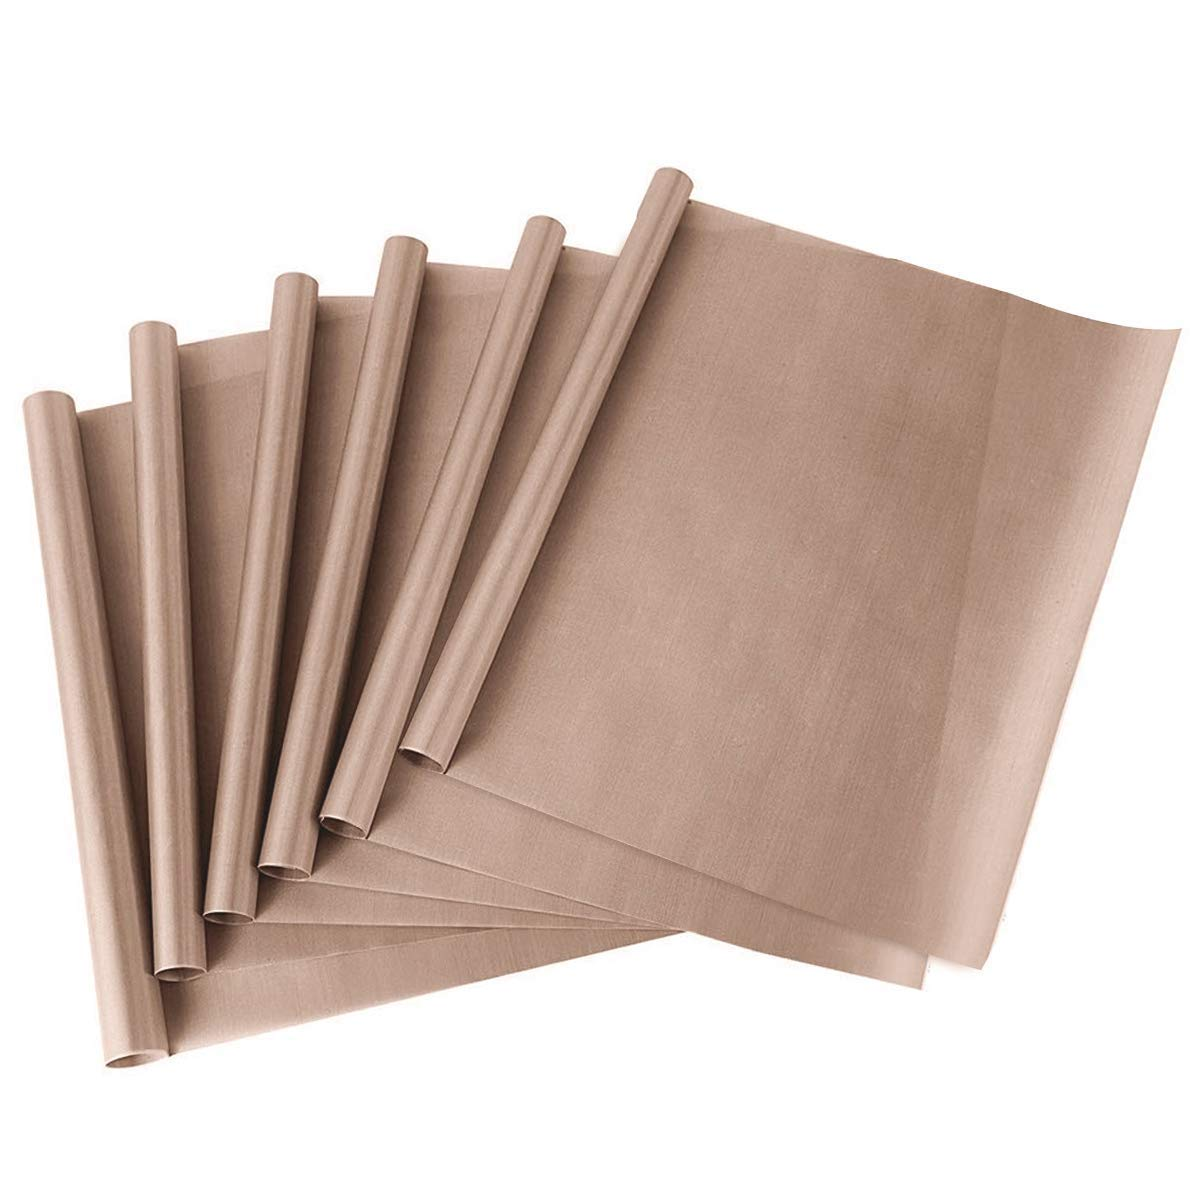 PTFE Teflon Sheet for Heat Press,Transfer Sheet - Non Stick 16 x 20 Reusable Heat Resistant Craft Mat, Protects Iron and Work Area(6 Pack) Tmtamye